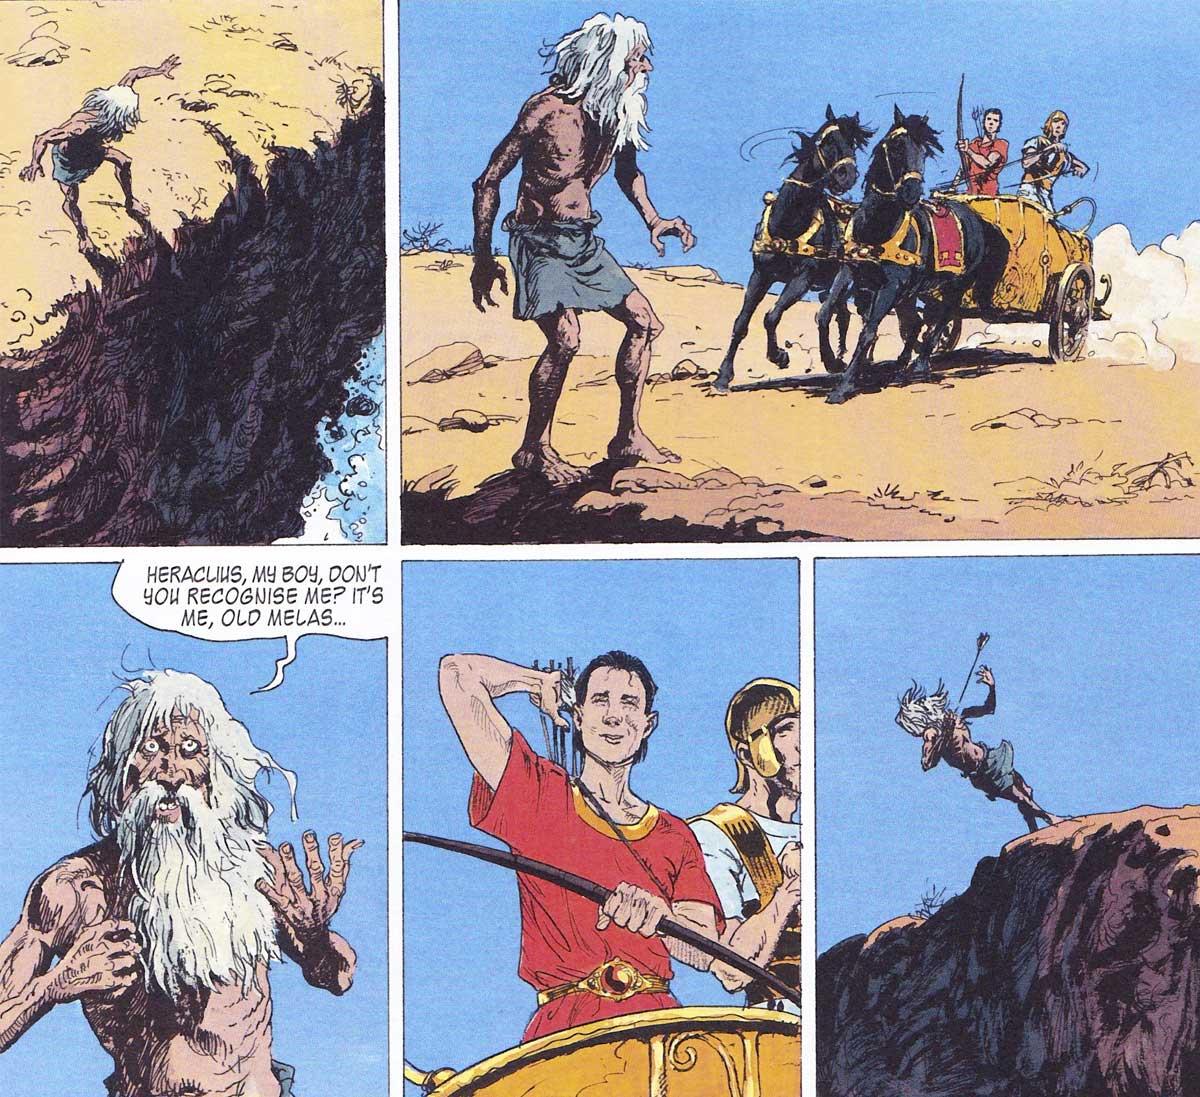 Golem-comics-resena-Thorgal-van-hamme-rosinski-06